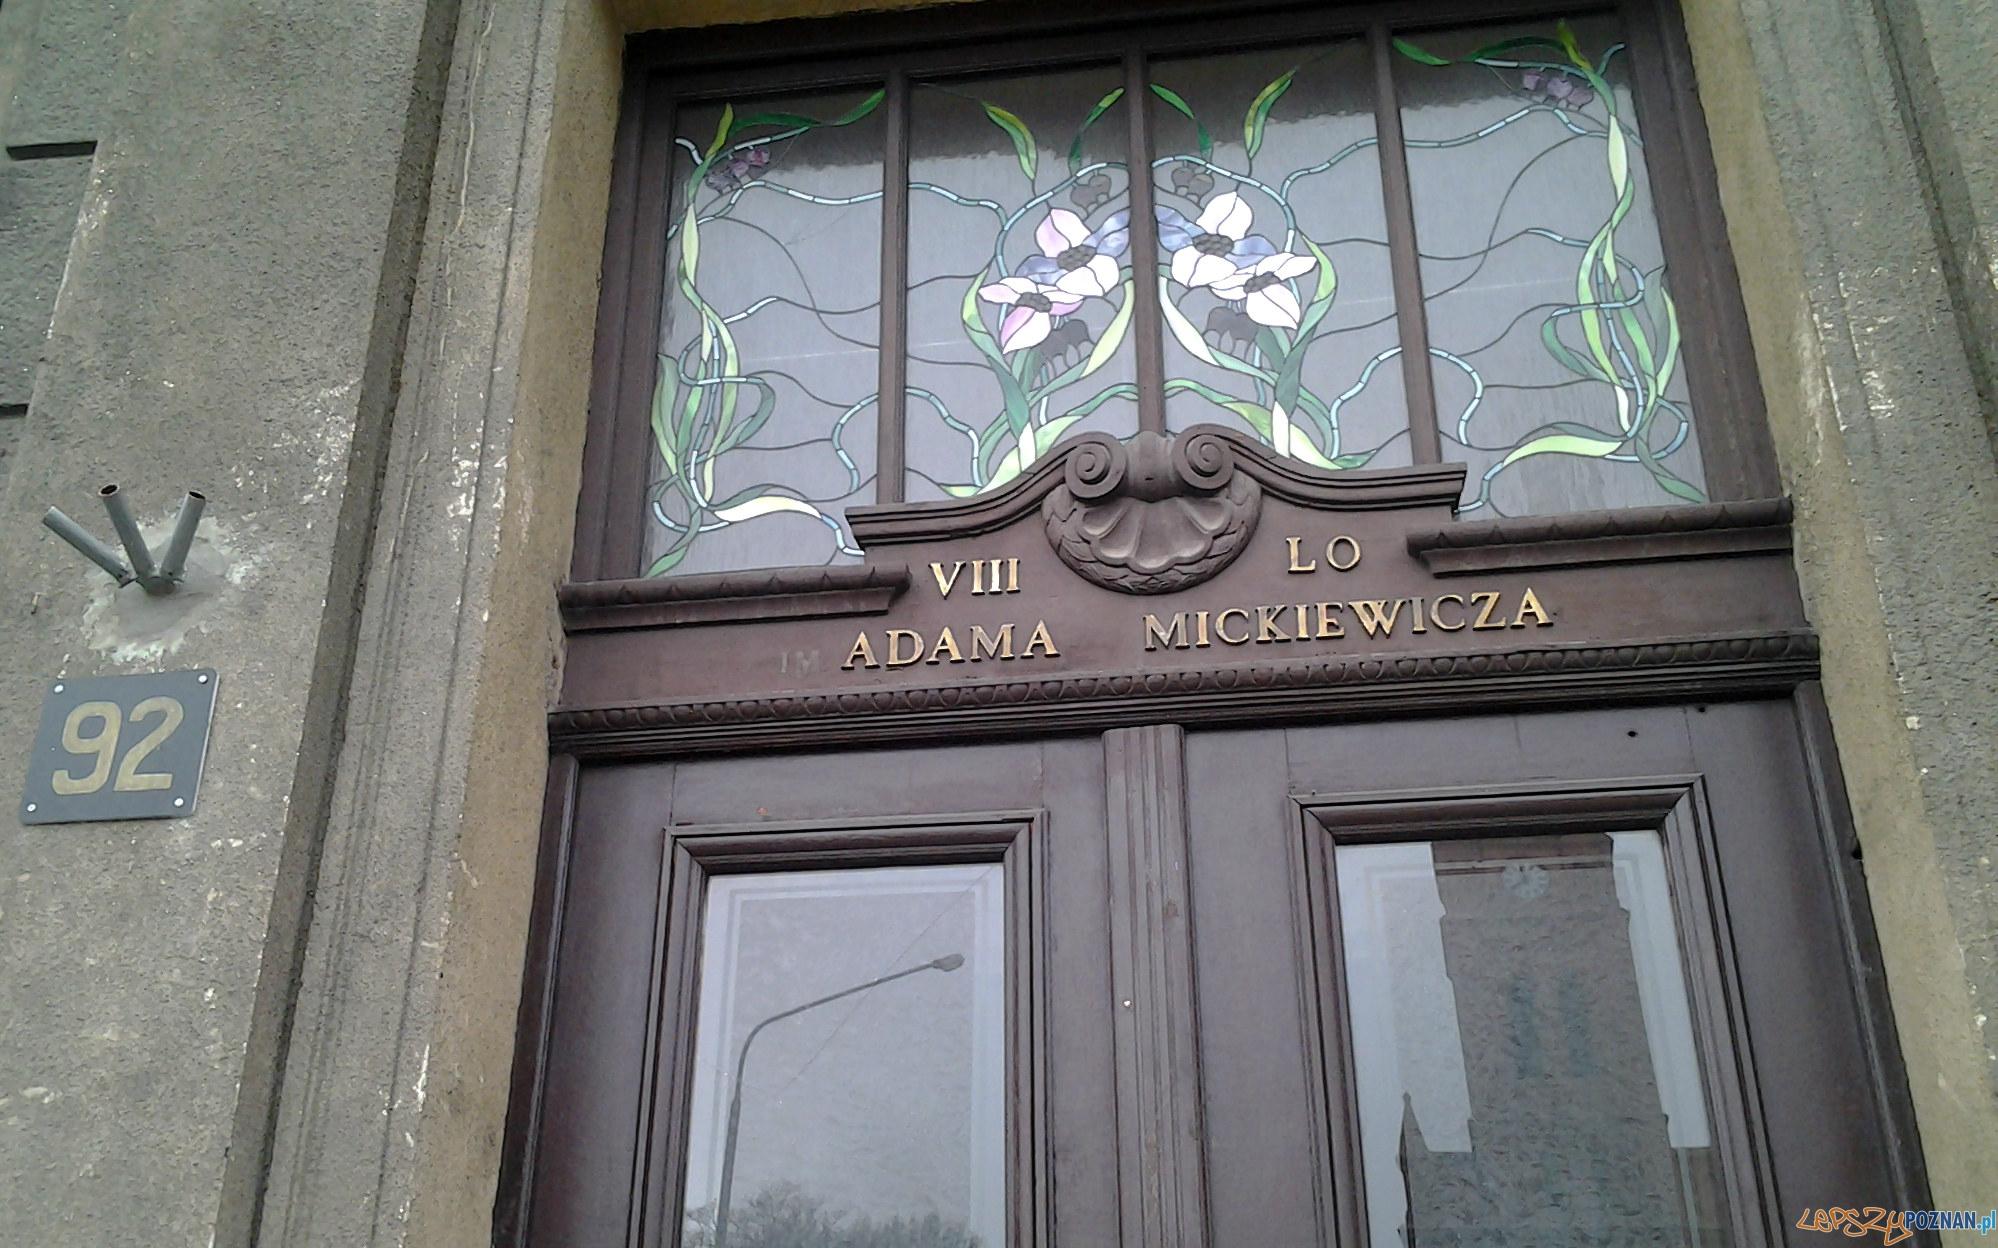 Ósemka - VIII LO - 8 LO  Foto: lepszyPOZNAN.pl / tab